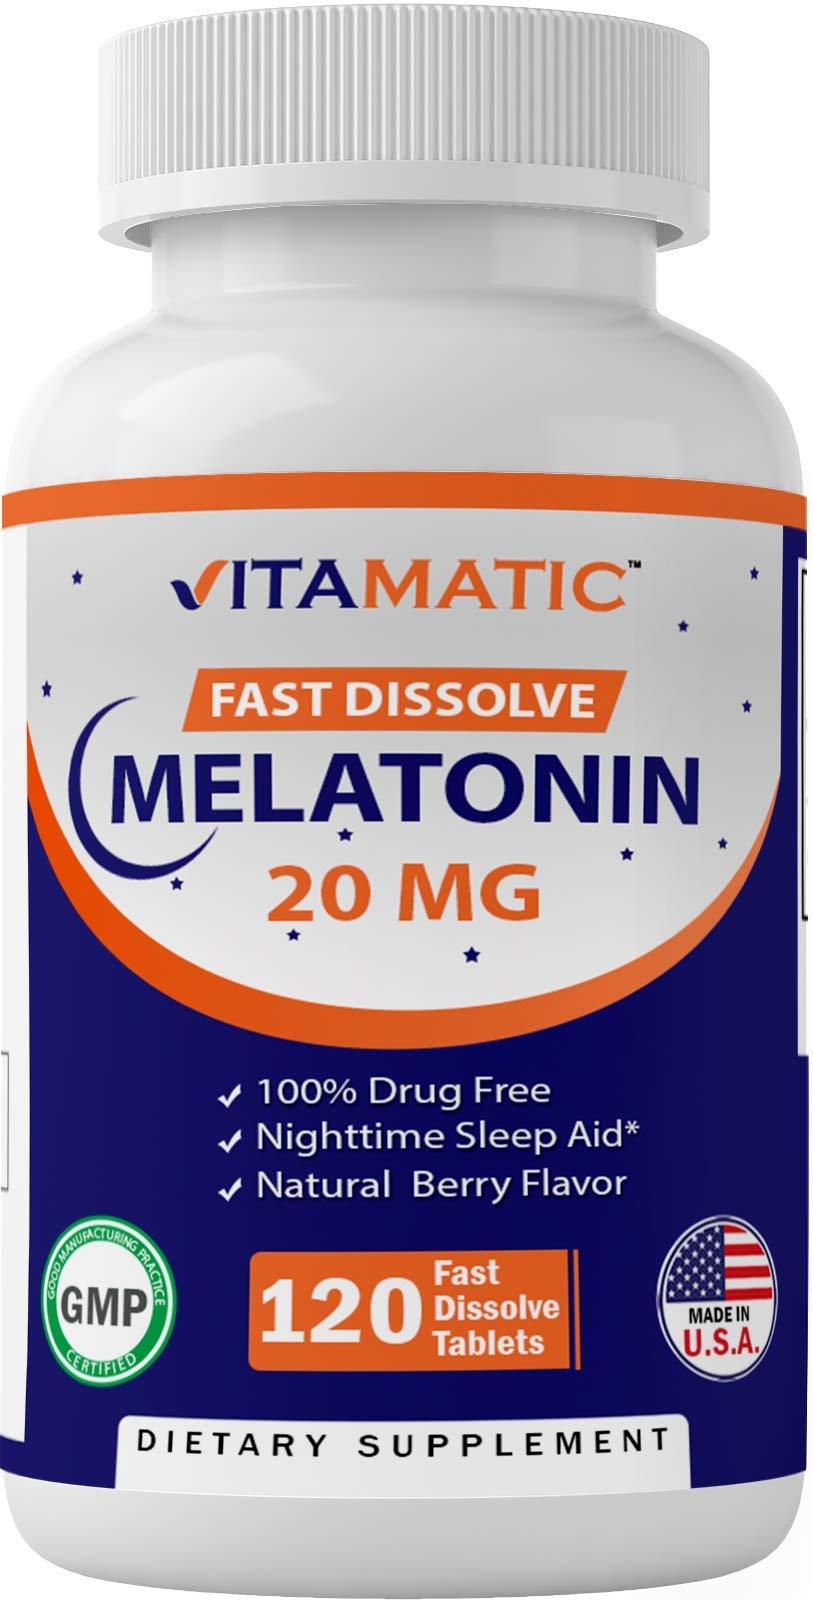 Vitamatic Melatonin 20mg Tablets   Vegetarian, Non-GMO, Gluten Free   HIGH Potency 20 MG   Natural Berry Flavor   120 Count